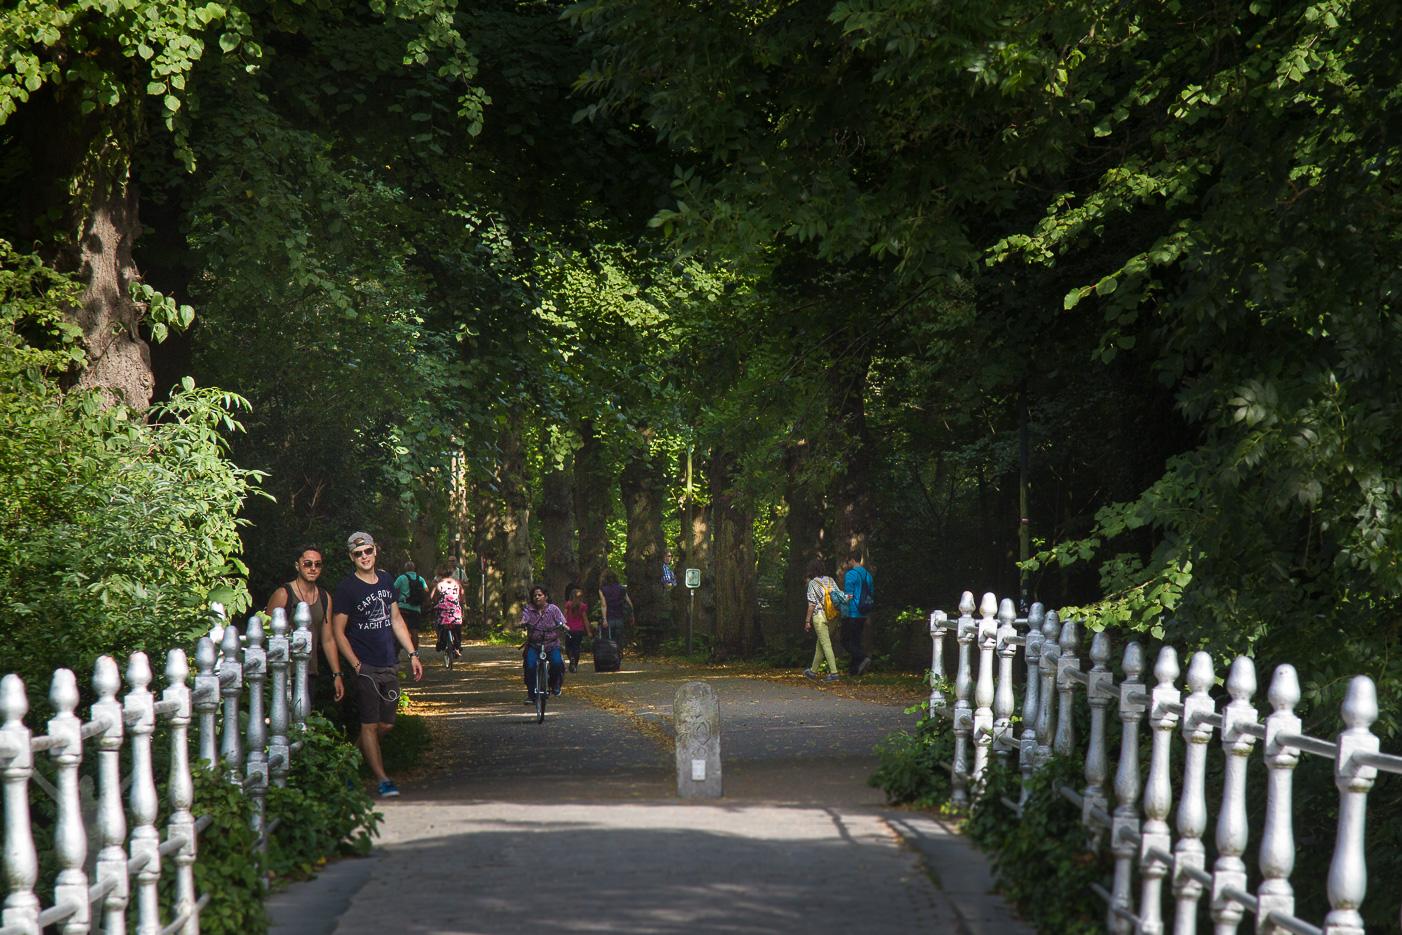 Minnewater Park